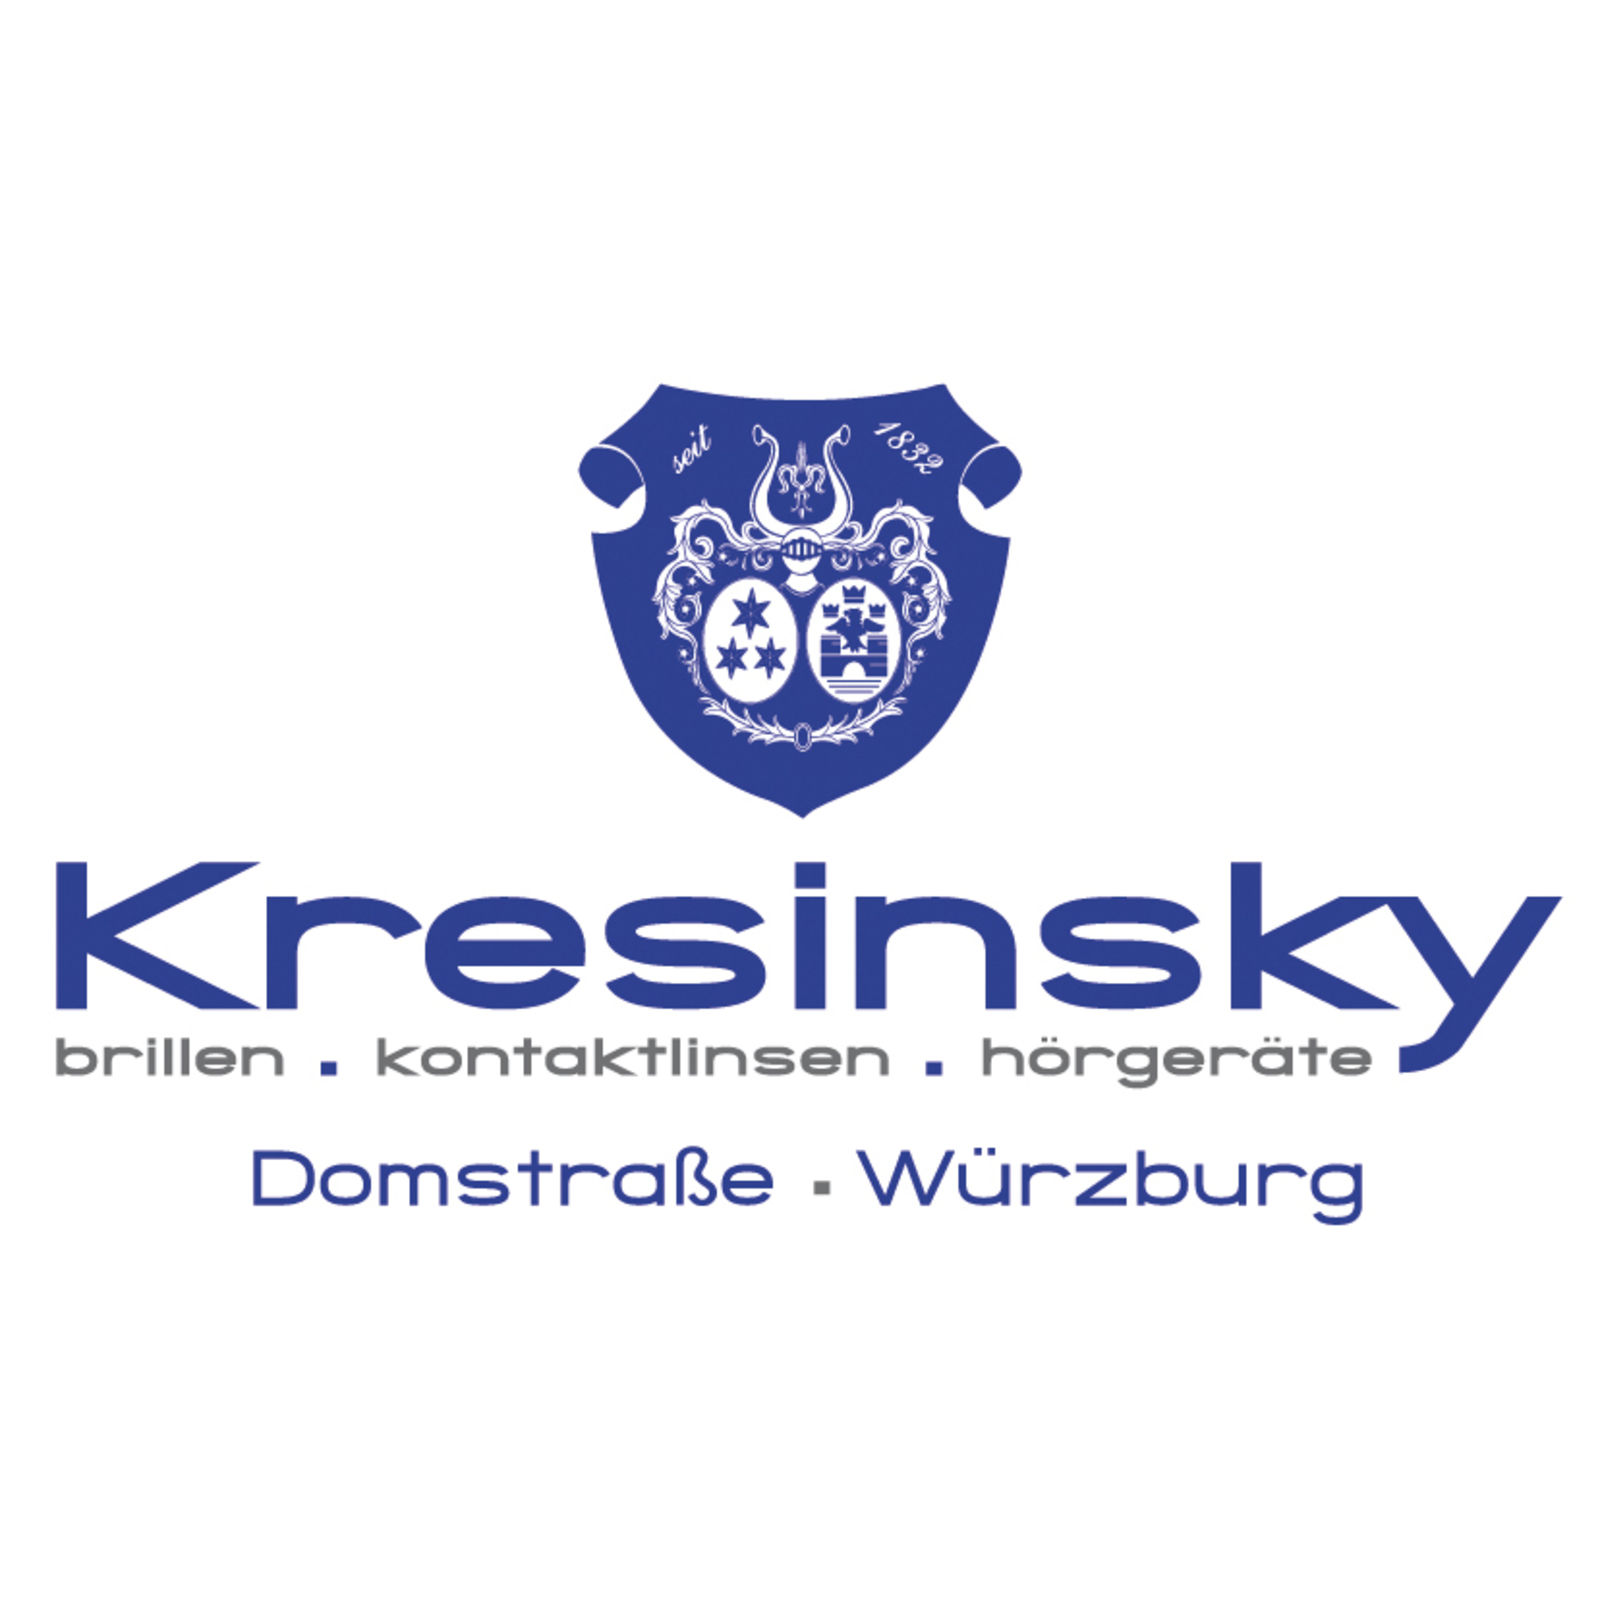 Kresinsky - brillen.kontaktlinsen.hörgeräte in Würzburg (Bild 2)